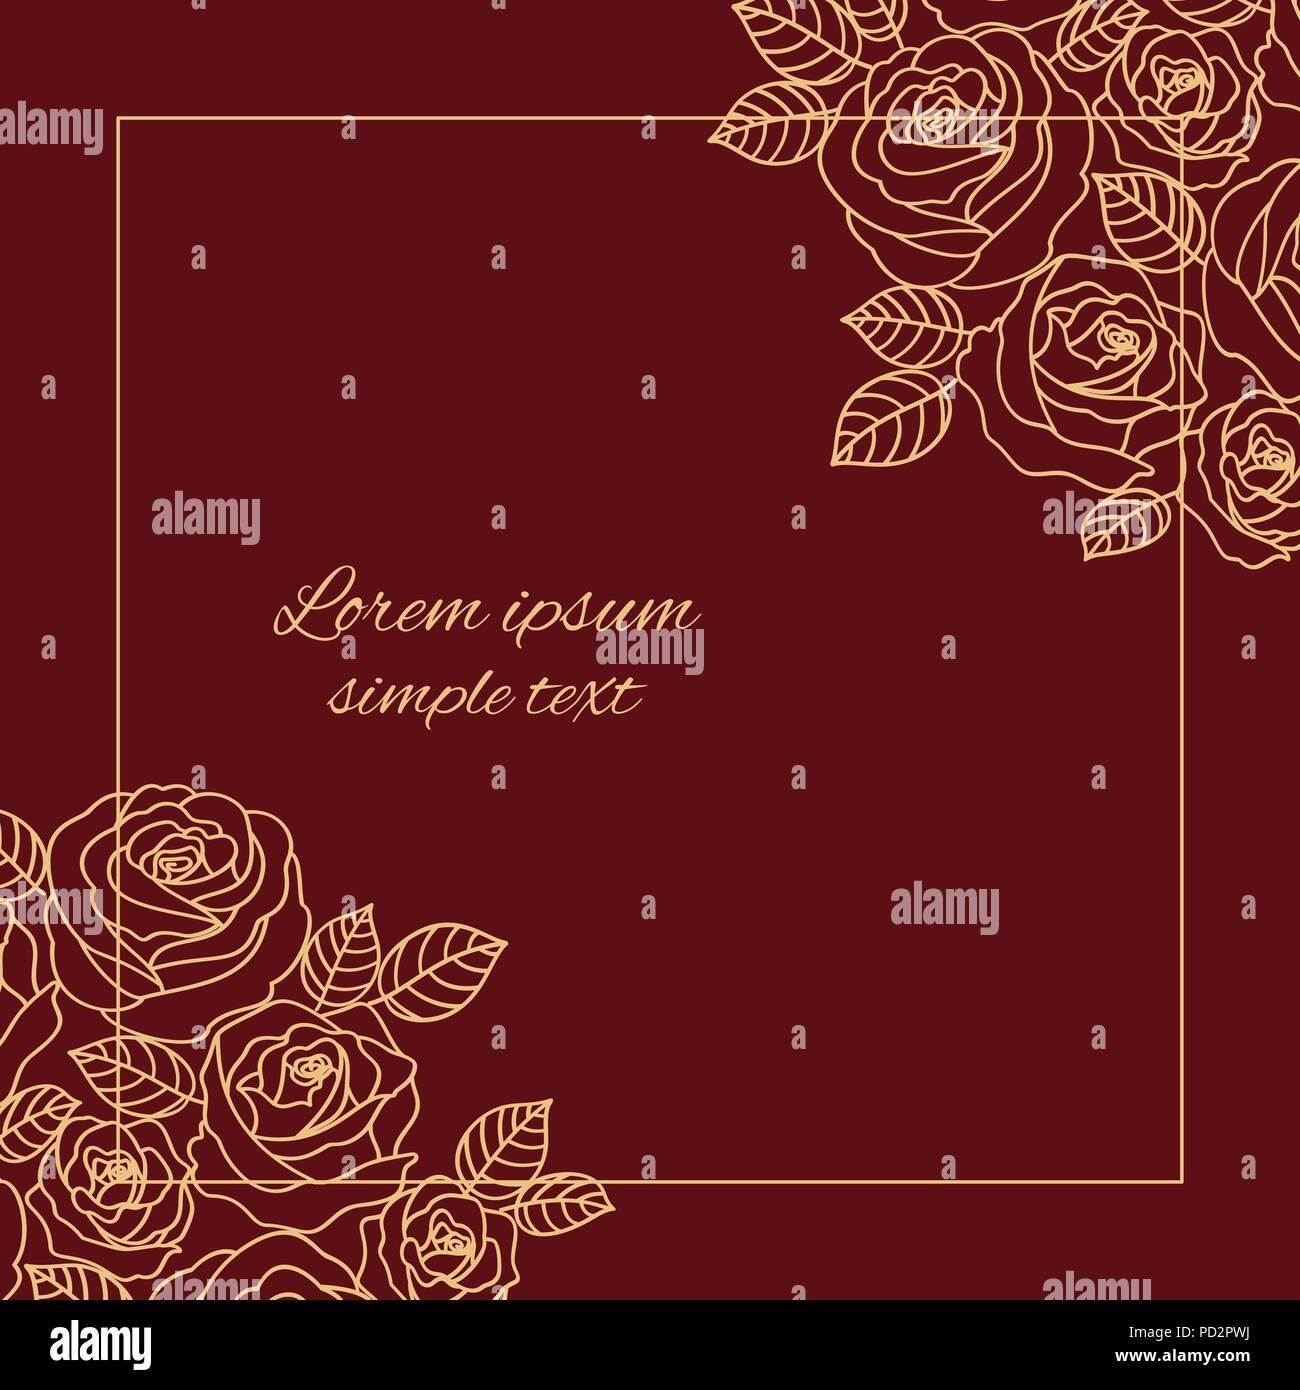 Wedding Invitation Outlines - www.terimarieharrison.com - Best ...